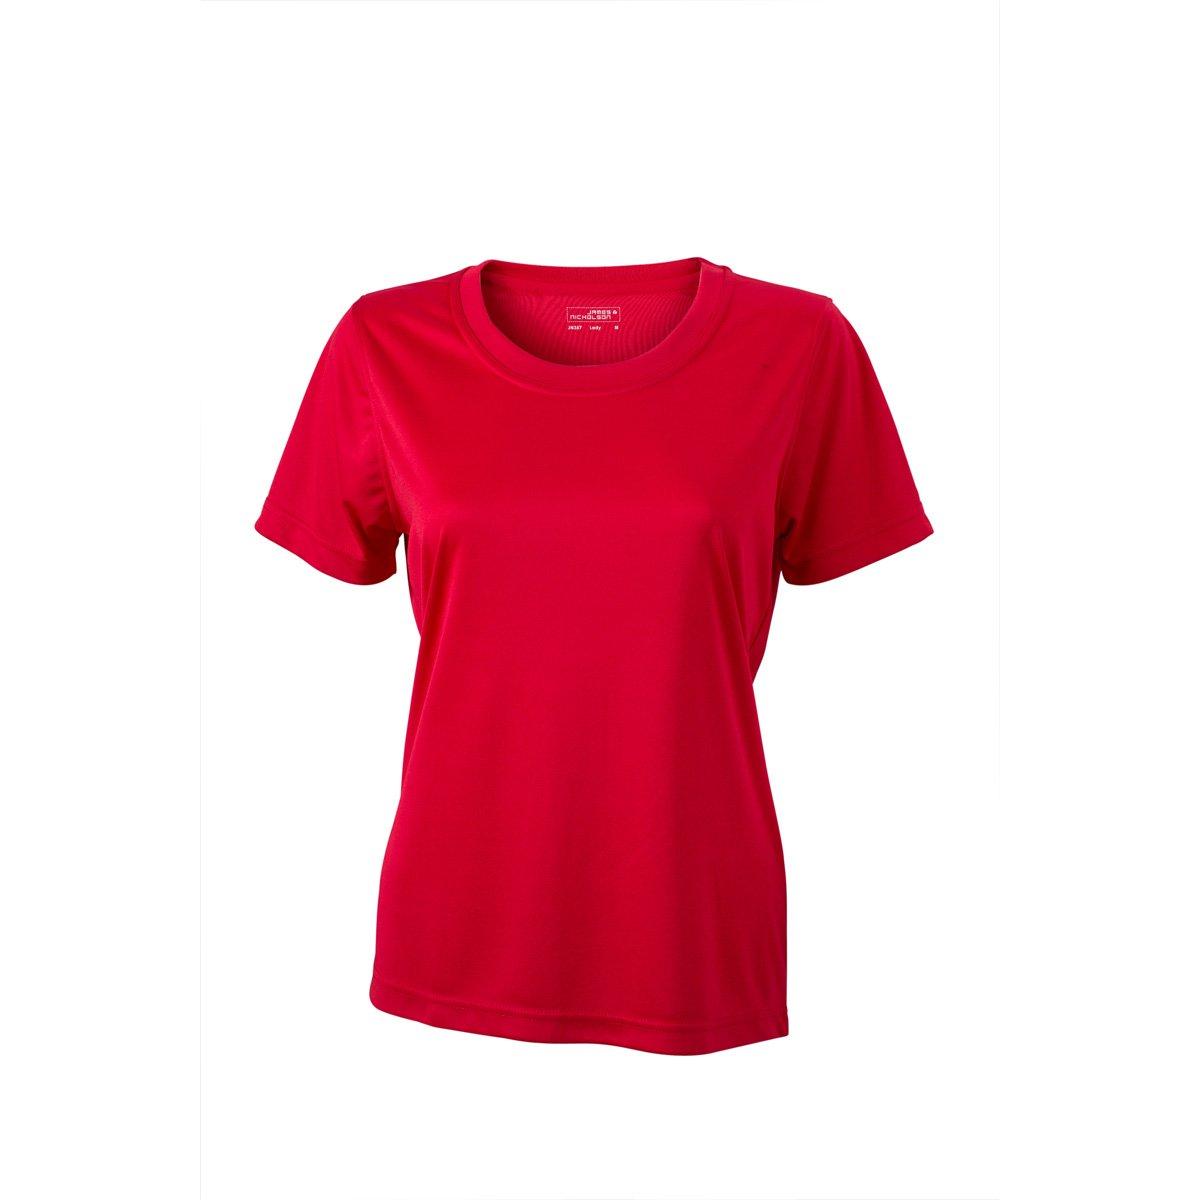 /poli/éster/ /Mujer /t/écnica/ /jn357/ /Camiseta de Manga Corta Transpirable/ James /& Nicholson/ /Secado r/ápido/